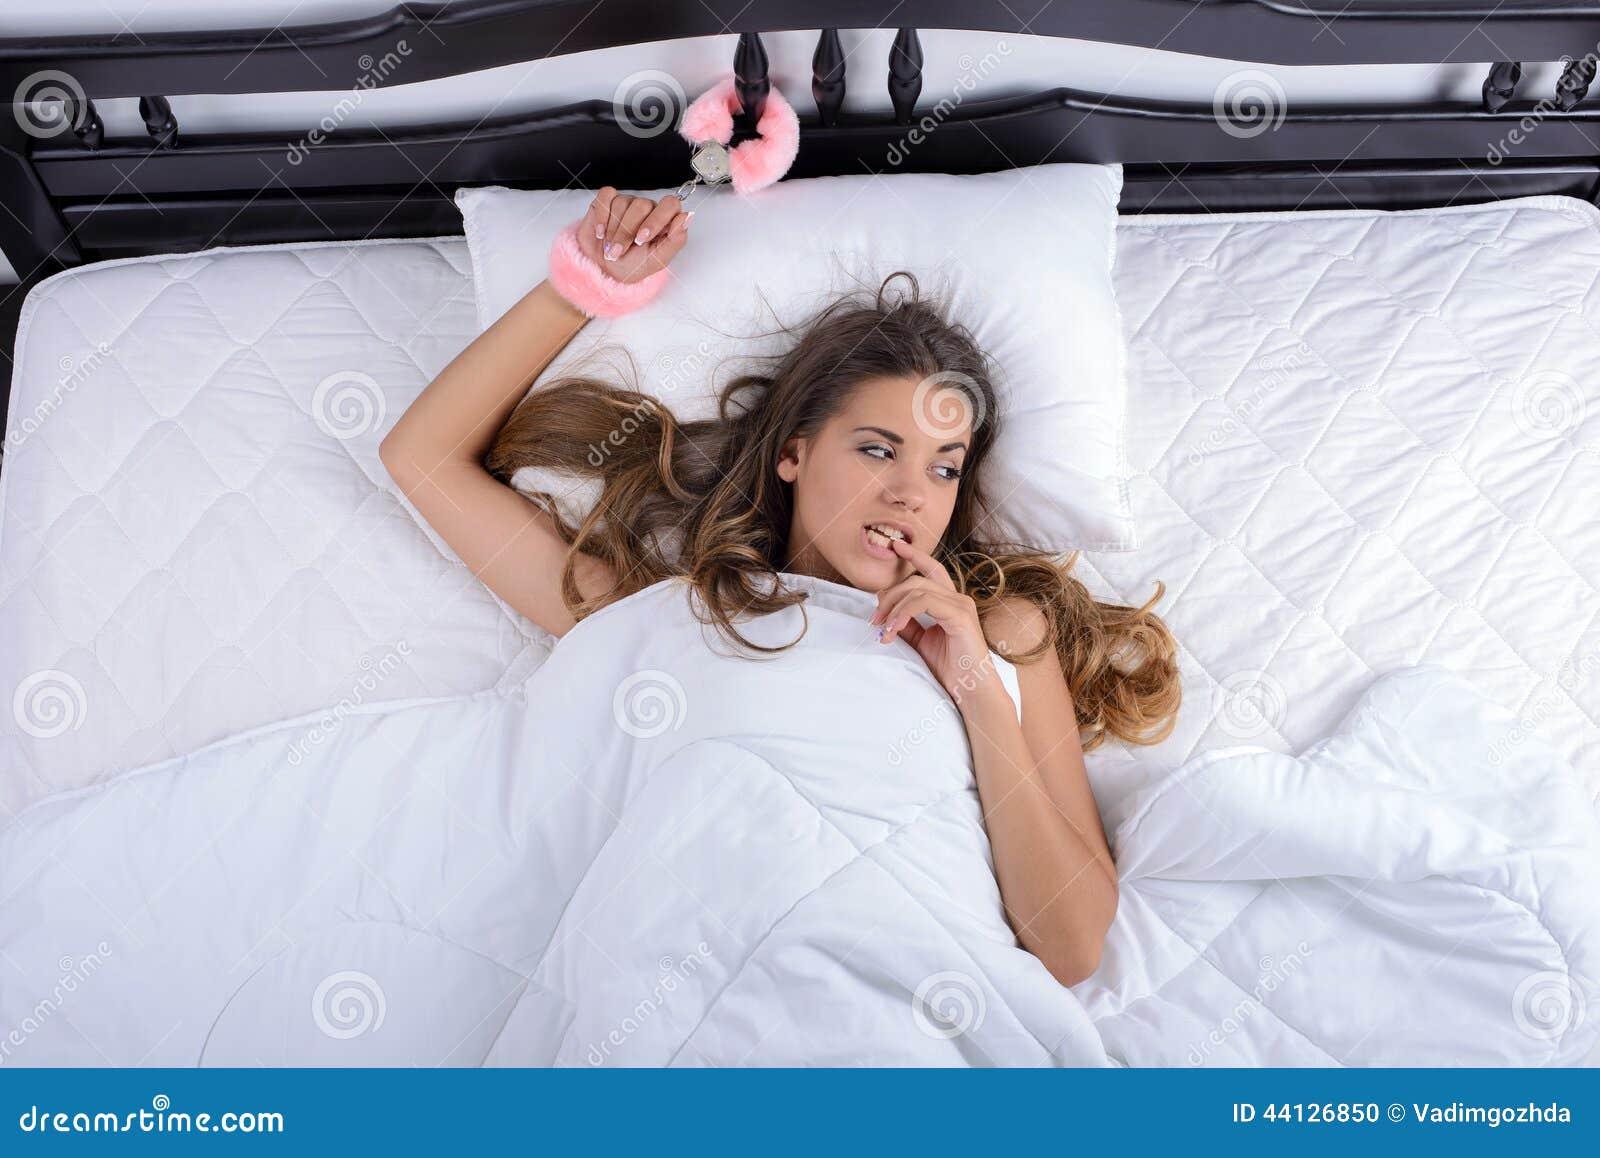 Прикована наручниками к кровати фото 3 фотография